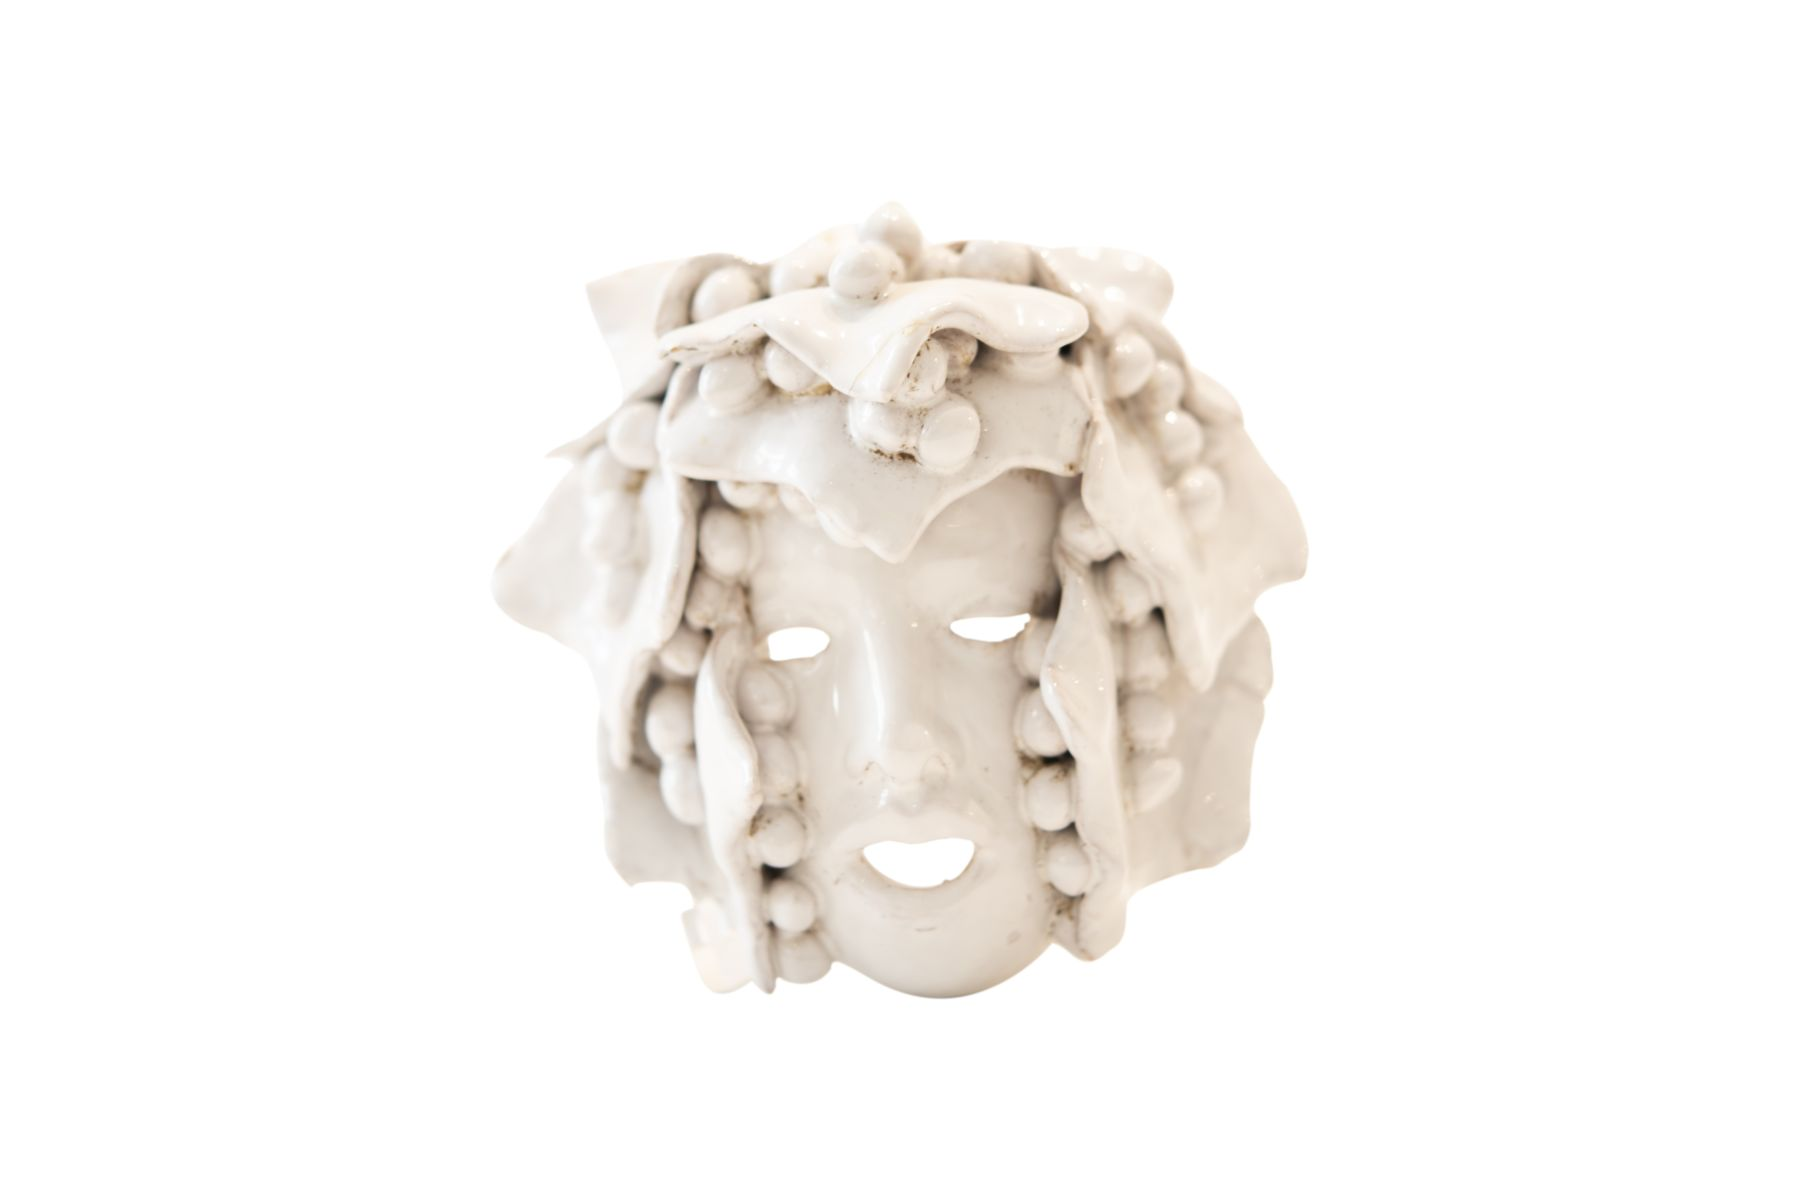 #171 Porcelain Mask   Porzellanmaske Image